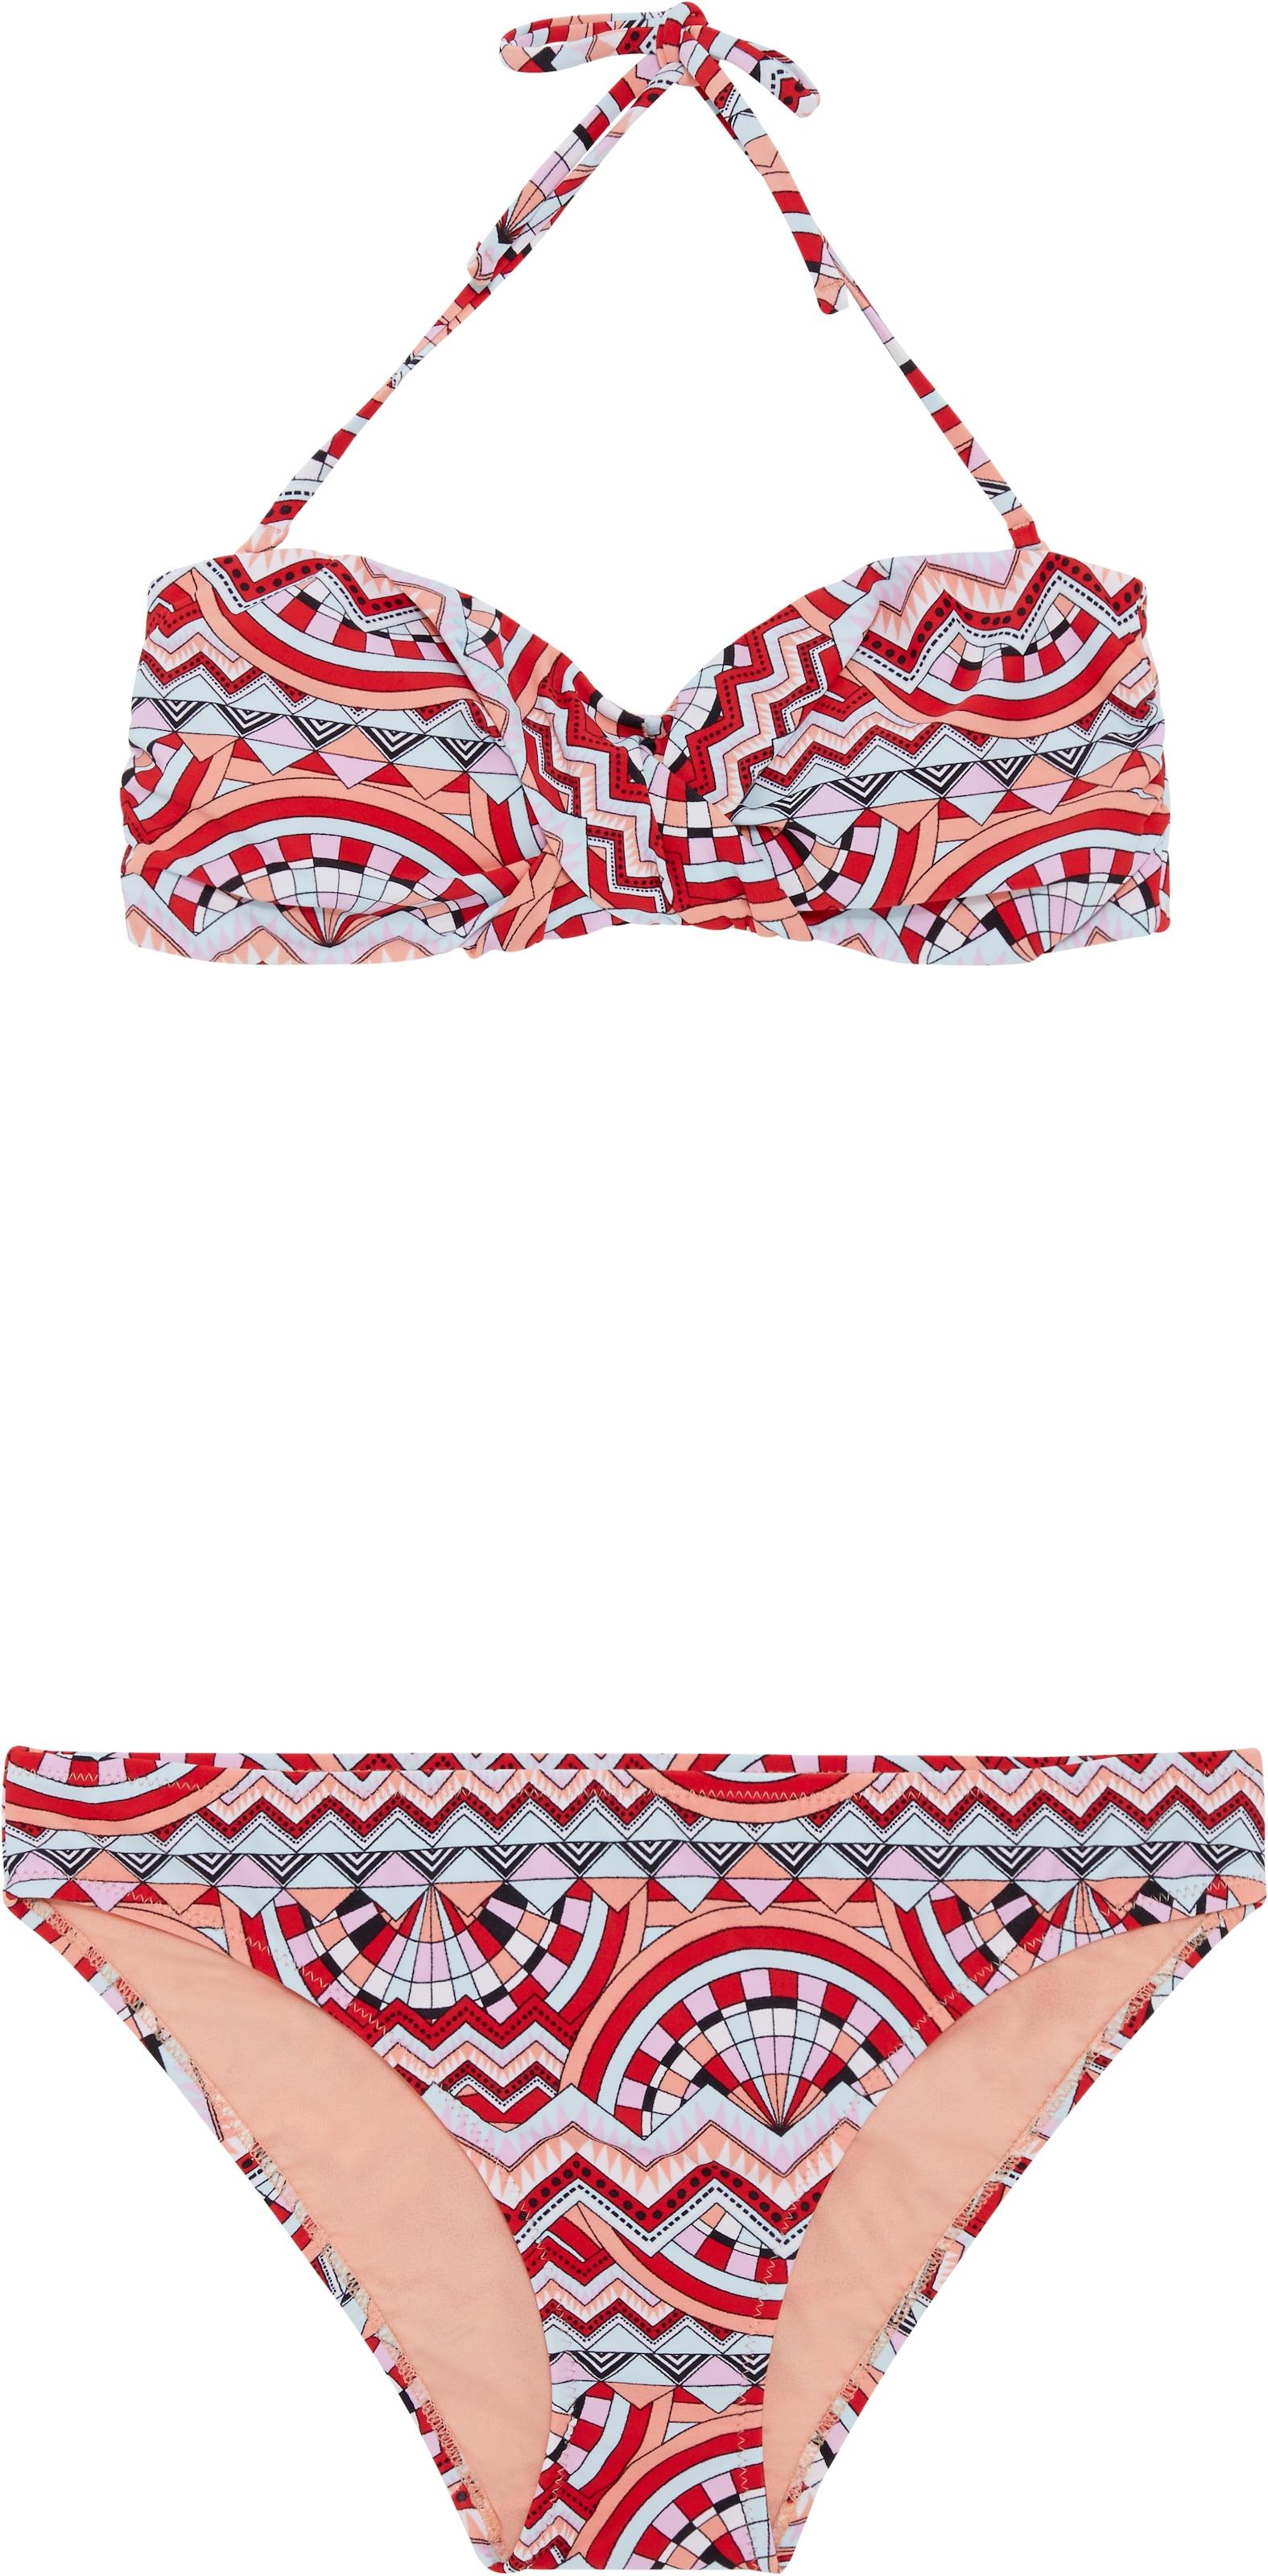 'ebony' Chiemsee Rouge Bikini BleuCorail En NwO0PkX8n